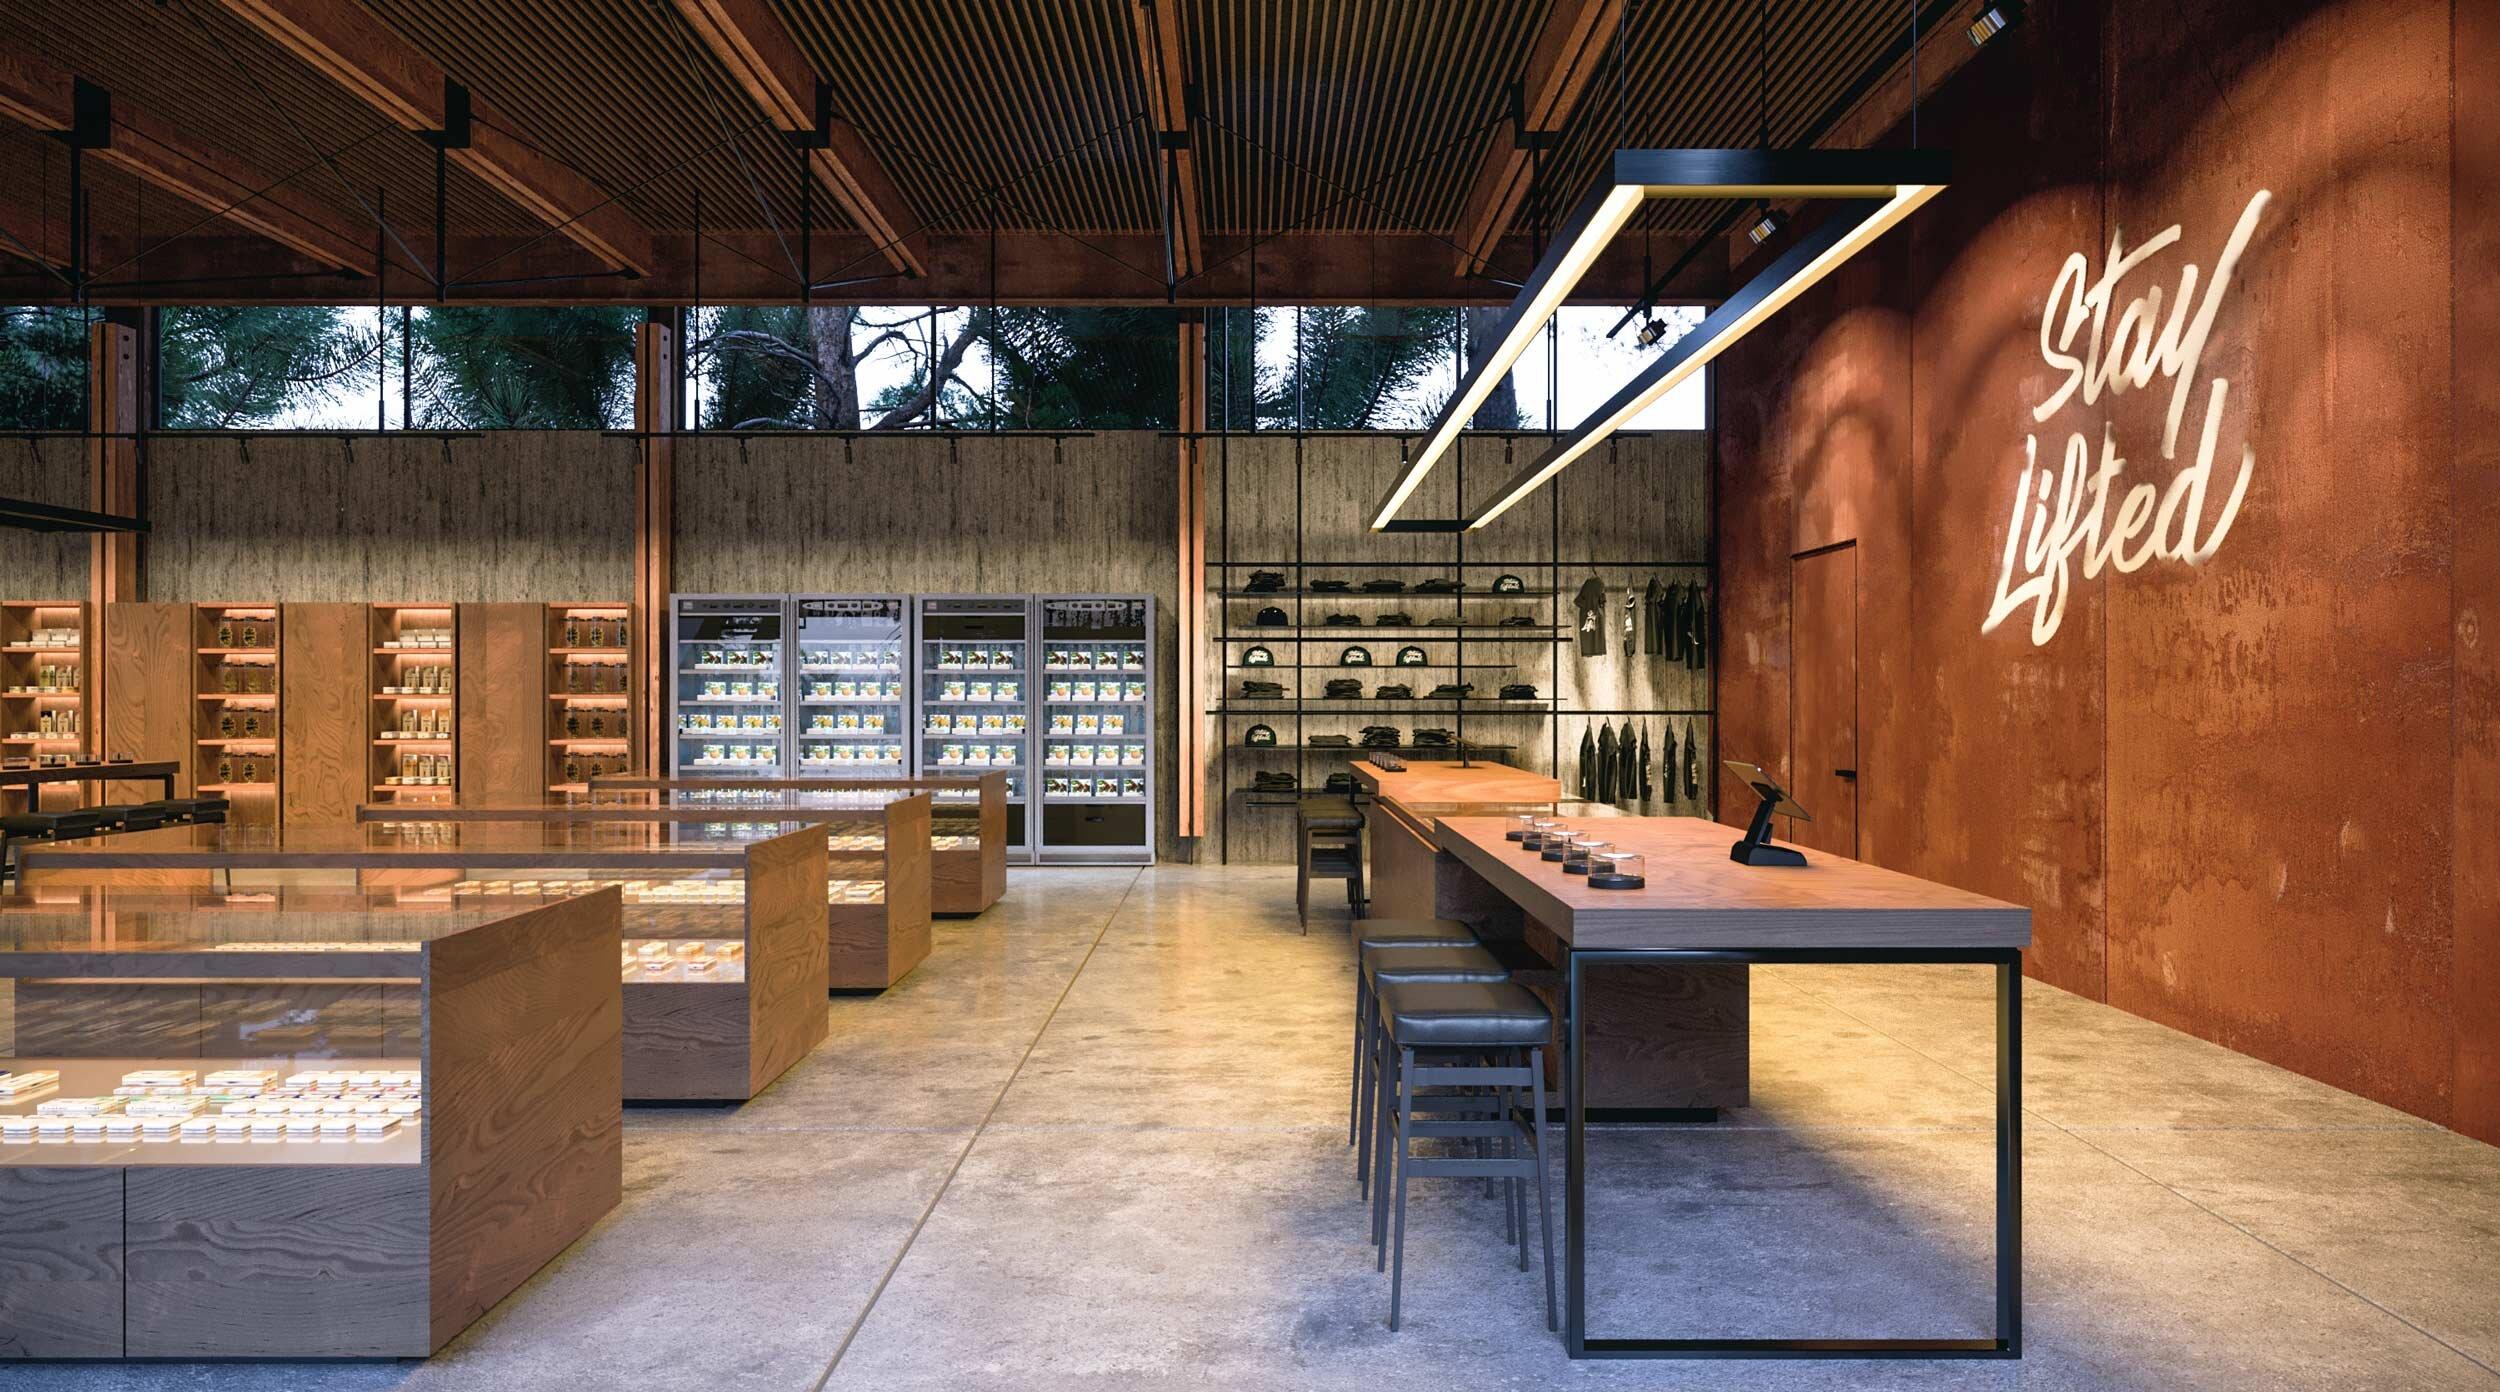 cannabis-retail-store-south-lake-tahoe-archillusion-design-02.jpg